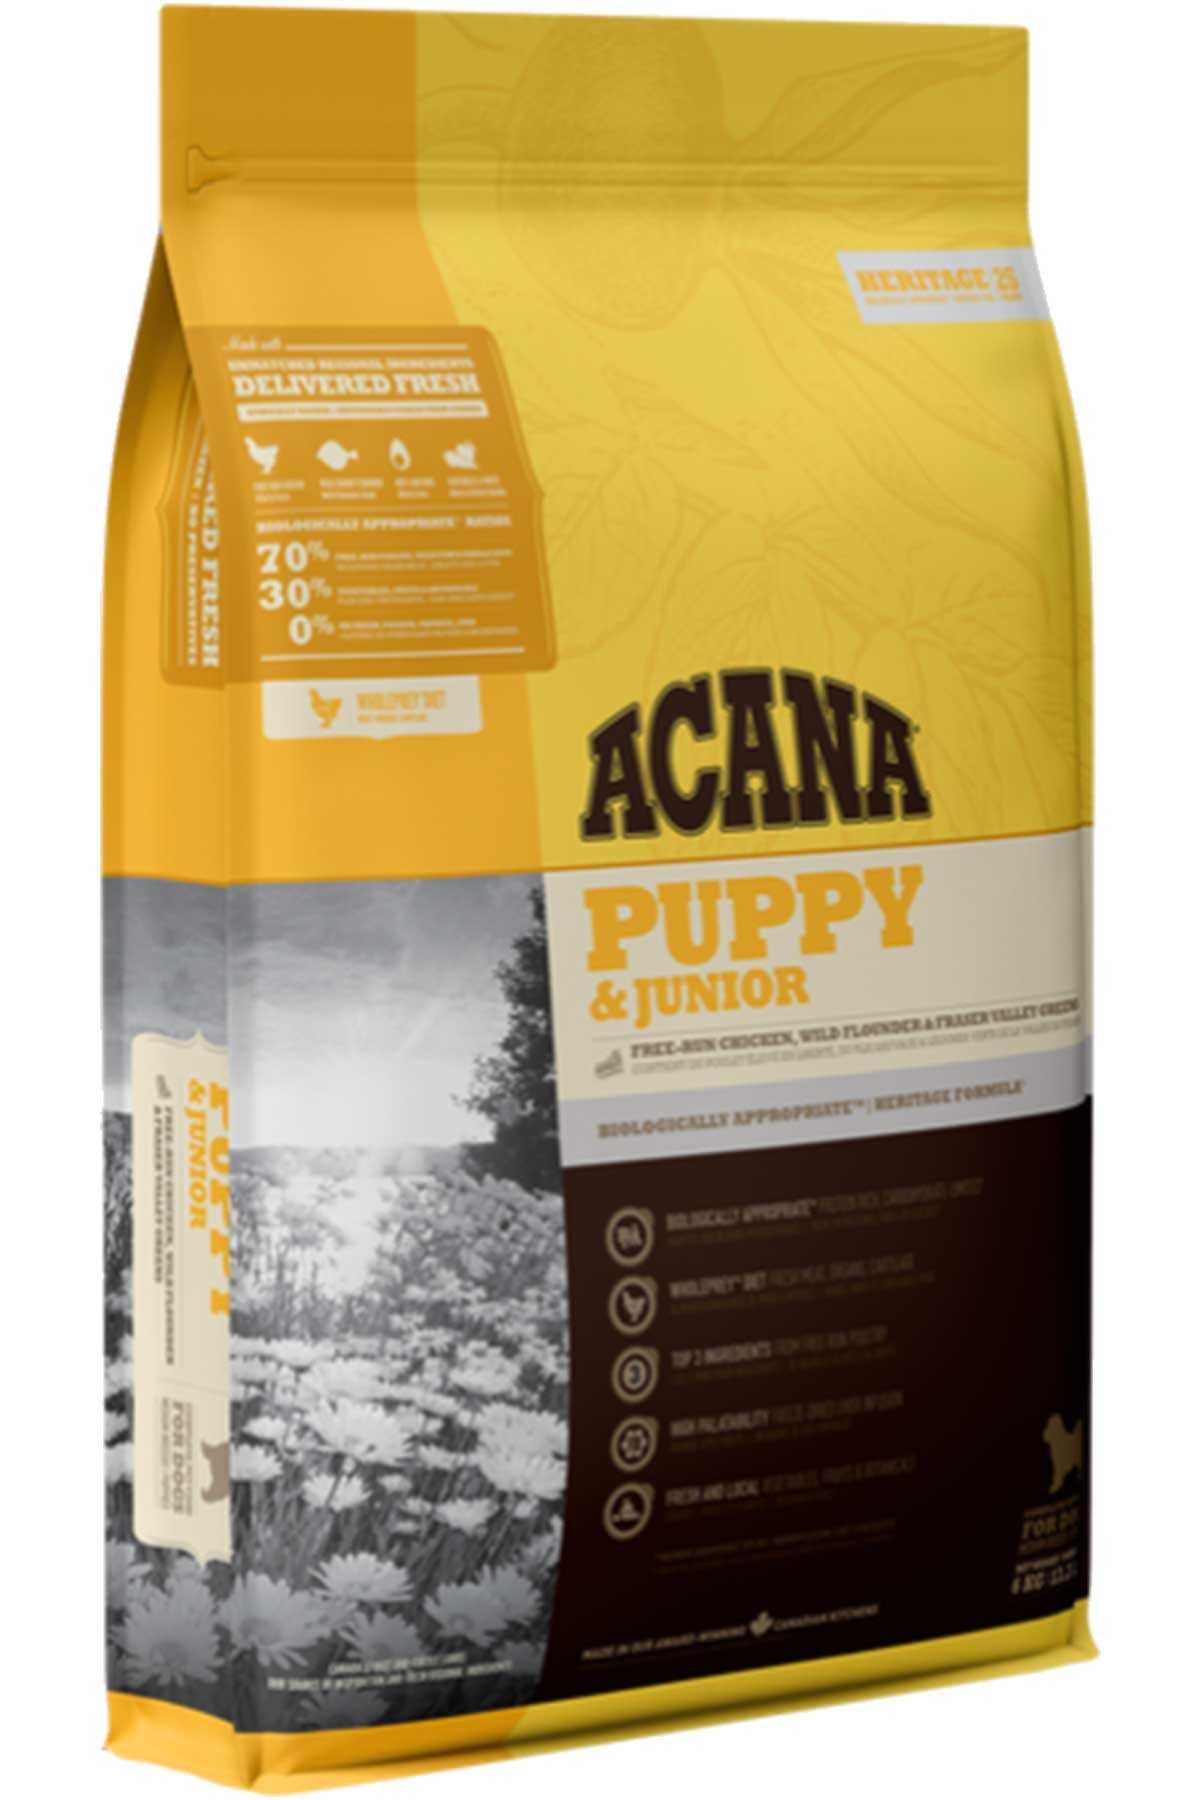 Acana Puppy & Junior Tahılsız Yavru Köpek Maması 2kg